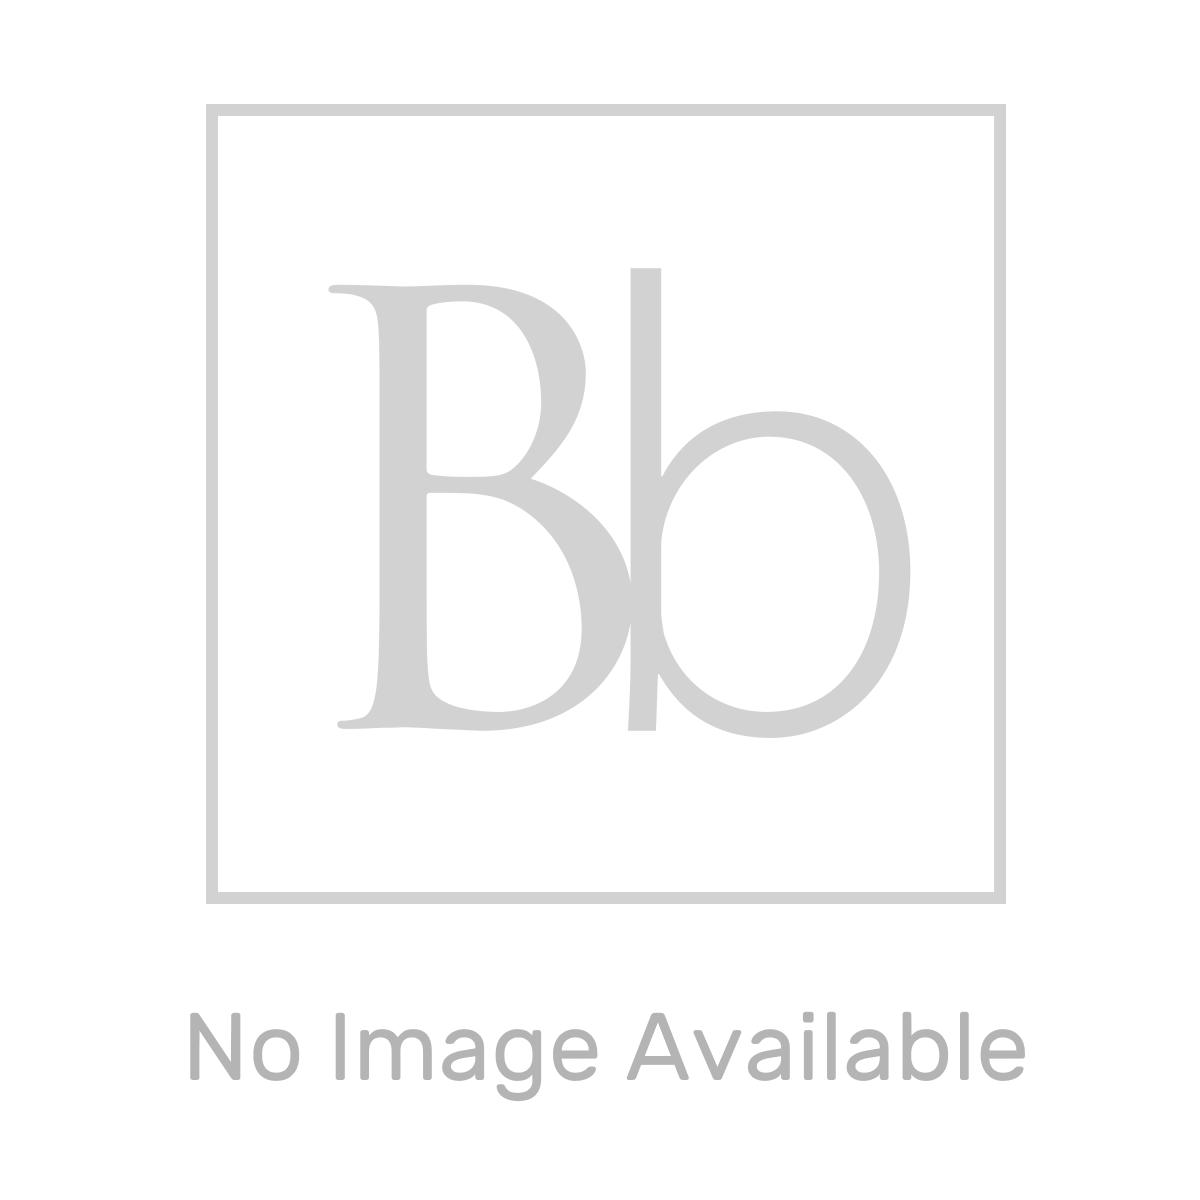 RAK Series 600 En-Suite Bathroom with Pacific Single Door Quadrant Shower Enclosure